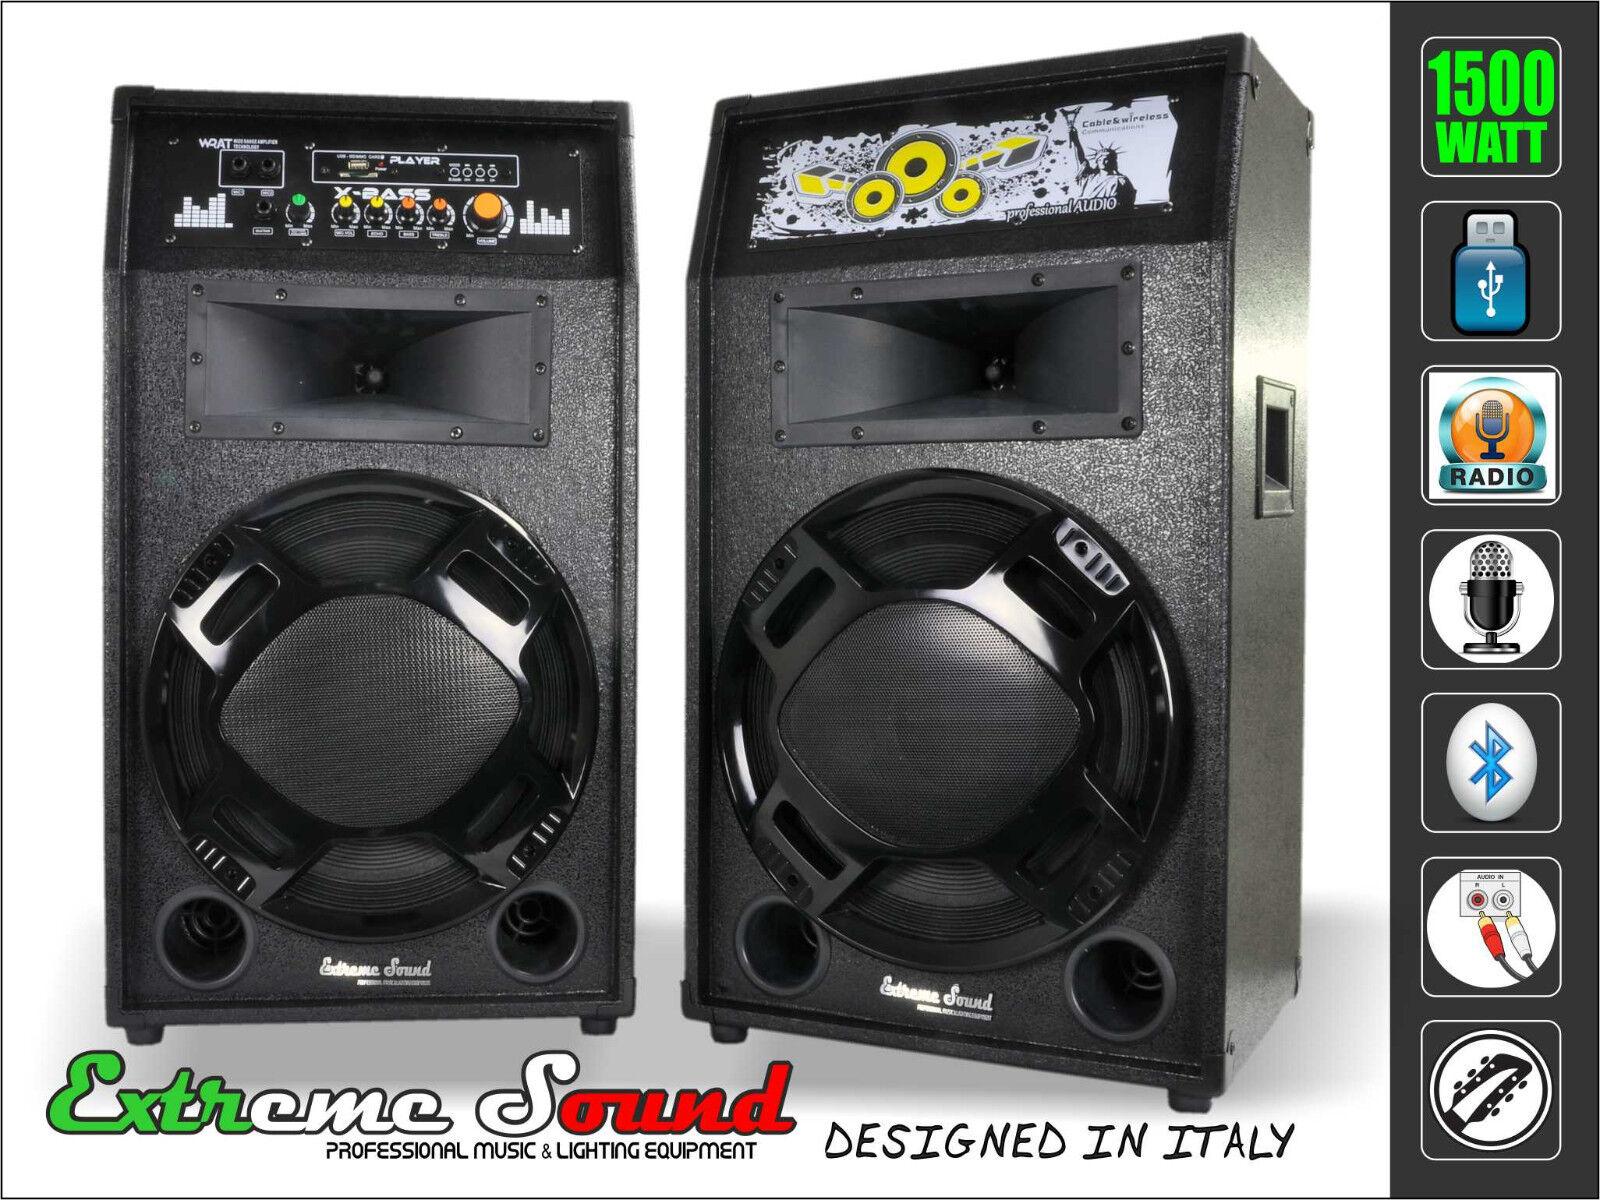 2 CASSE POTENZA 1500Watt Bluetooth USB RADIO FM Karaoke DJ Extreme Sound EXS-12E